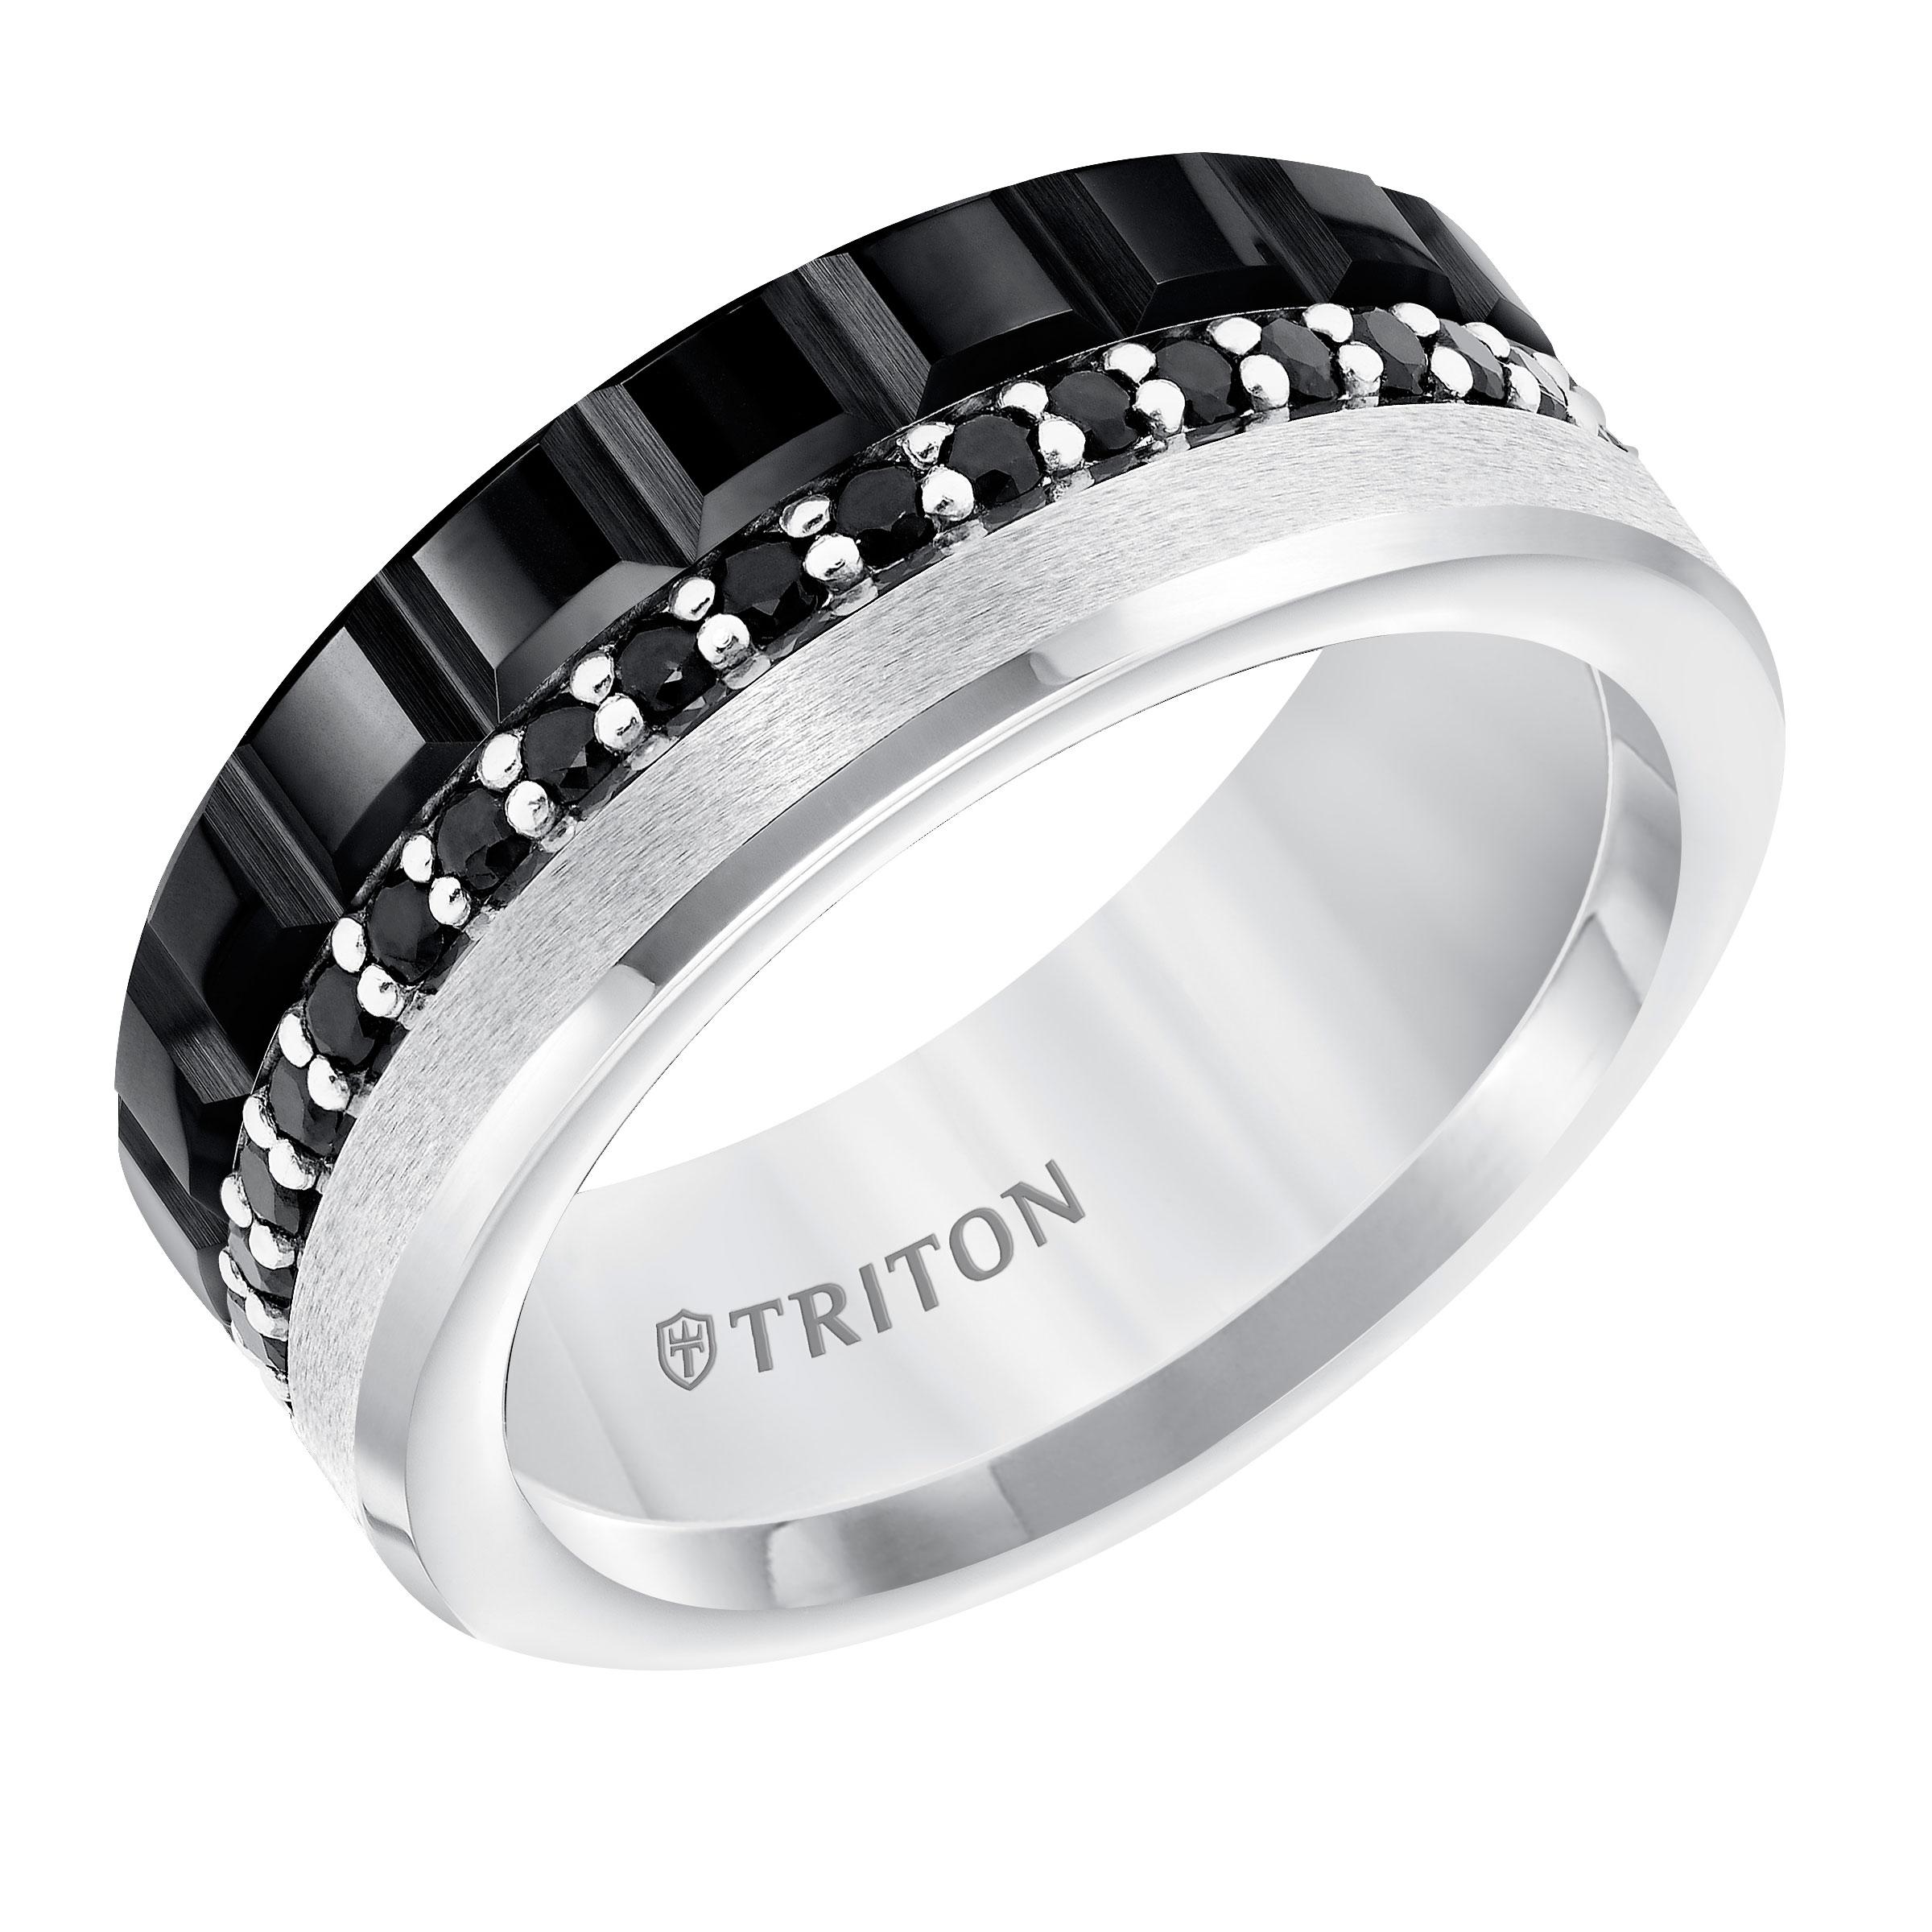 Triton 22 5457c100 g0 long island ny triton mens for Long island wedding bands